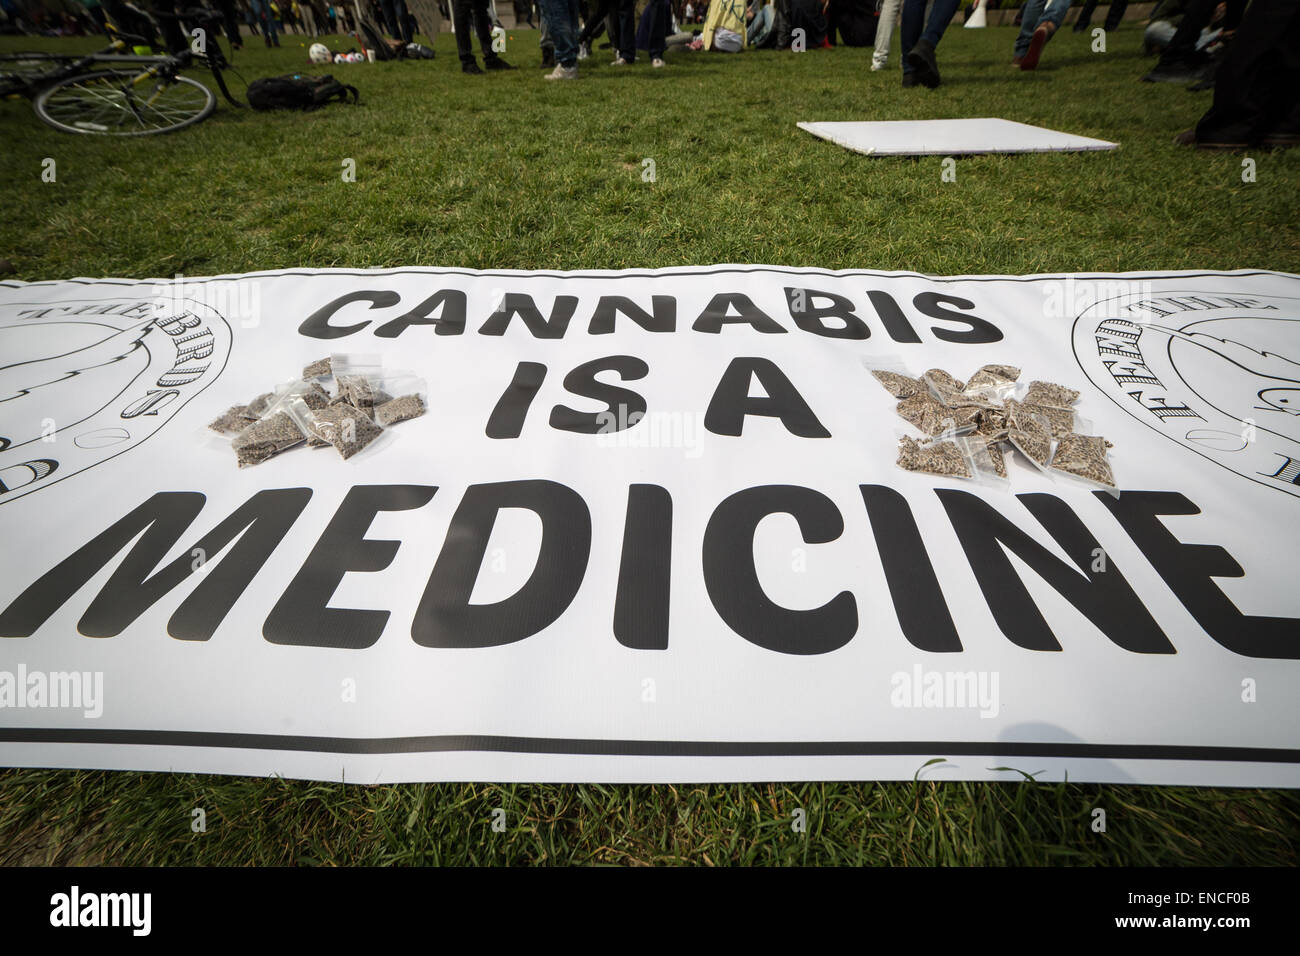 Cannabis Social Club Stock Photos & Cannabis Social Club Stock ...